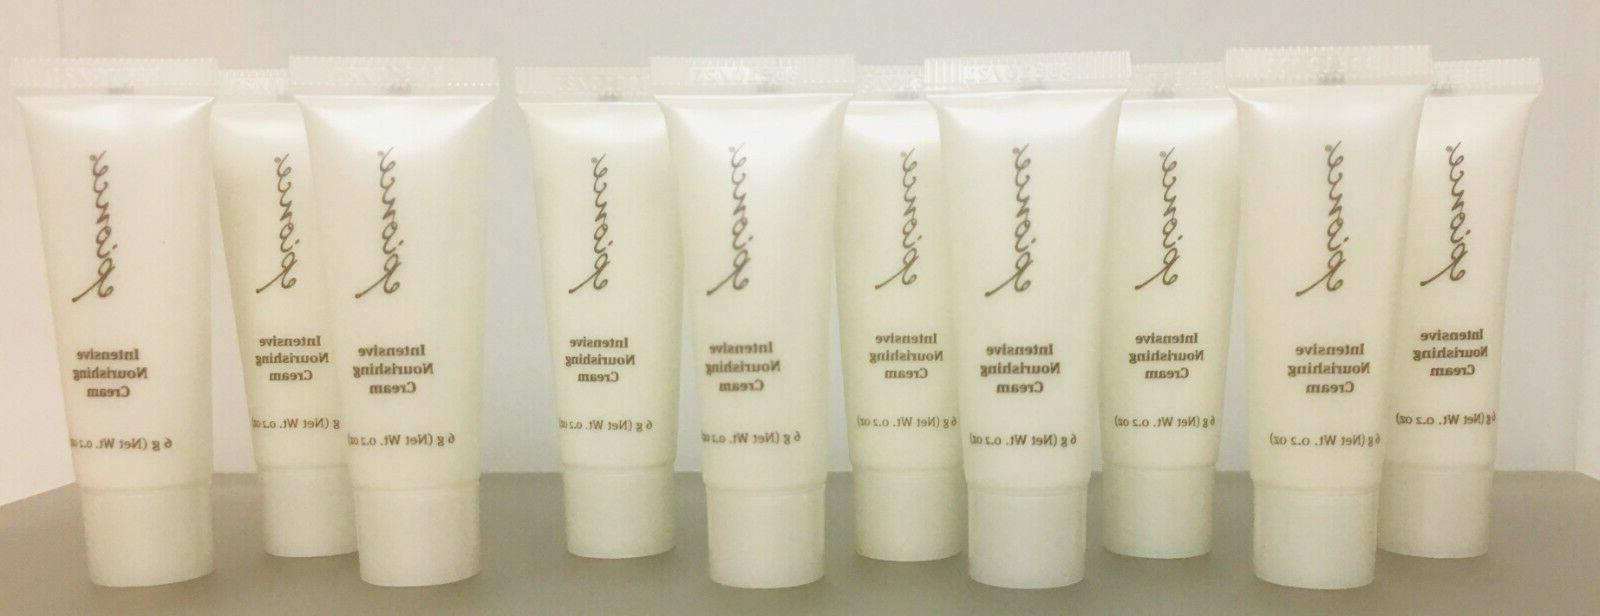 intensive nourishing cream travel size tubes 10